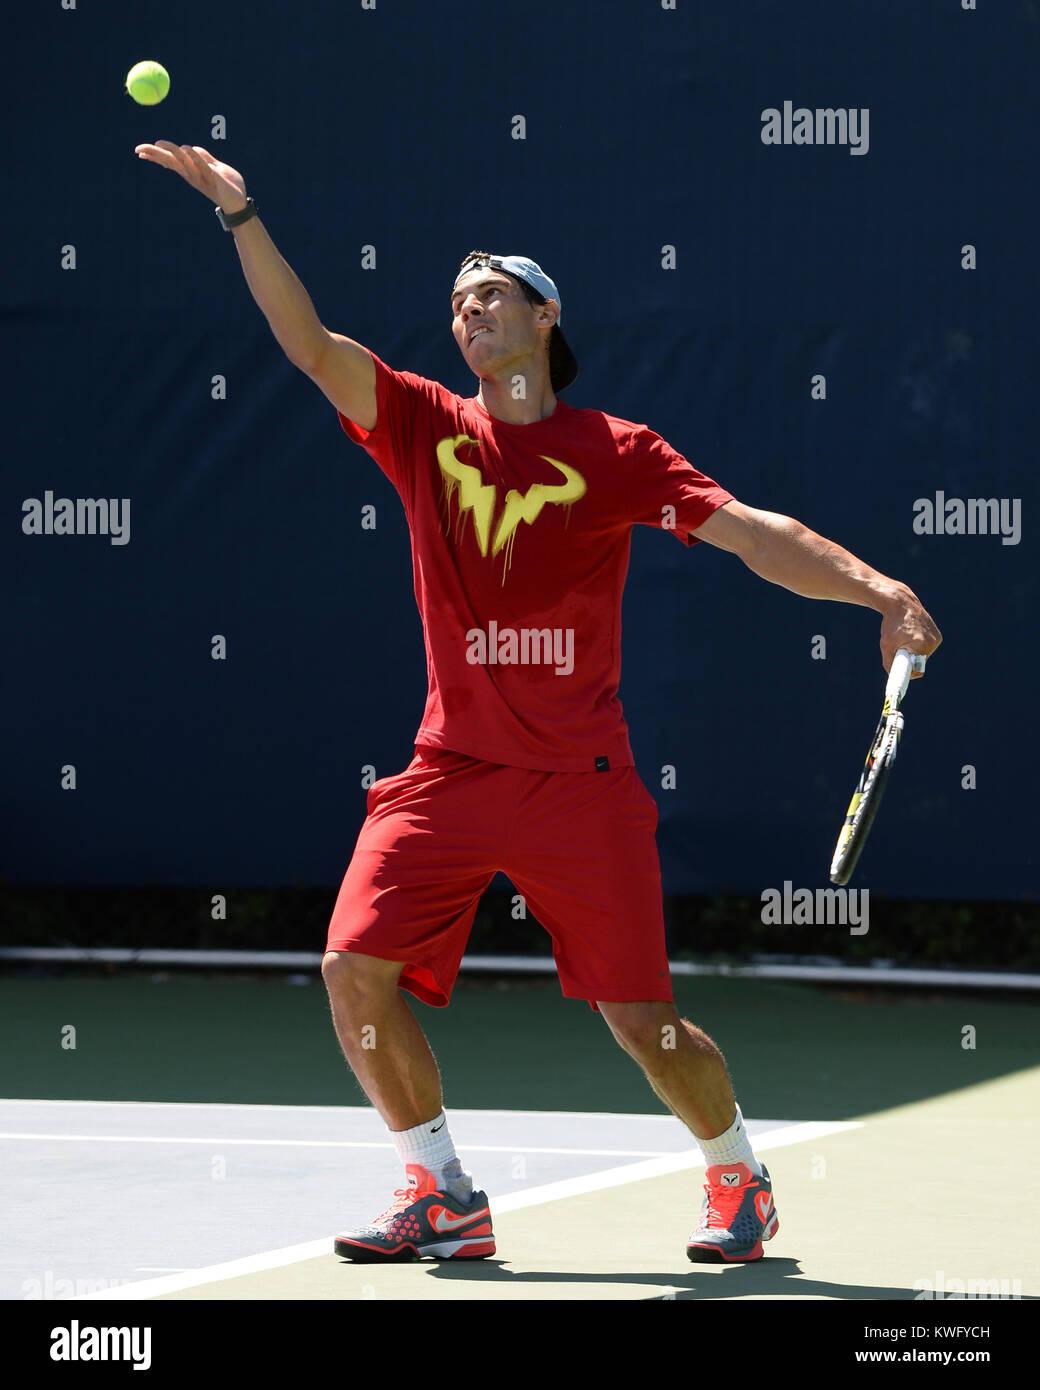 FLUSHING, NY - SEPTEMBER 06: Rafael Nadal day twelve of the 2013 US Open at USTA Billie Jean King National Tennis Stock Photo